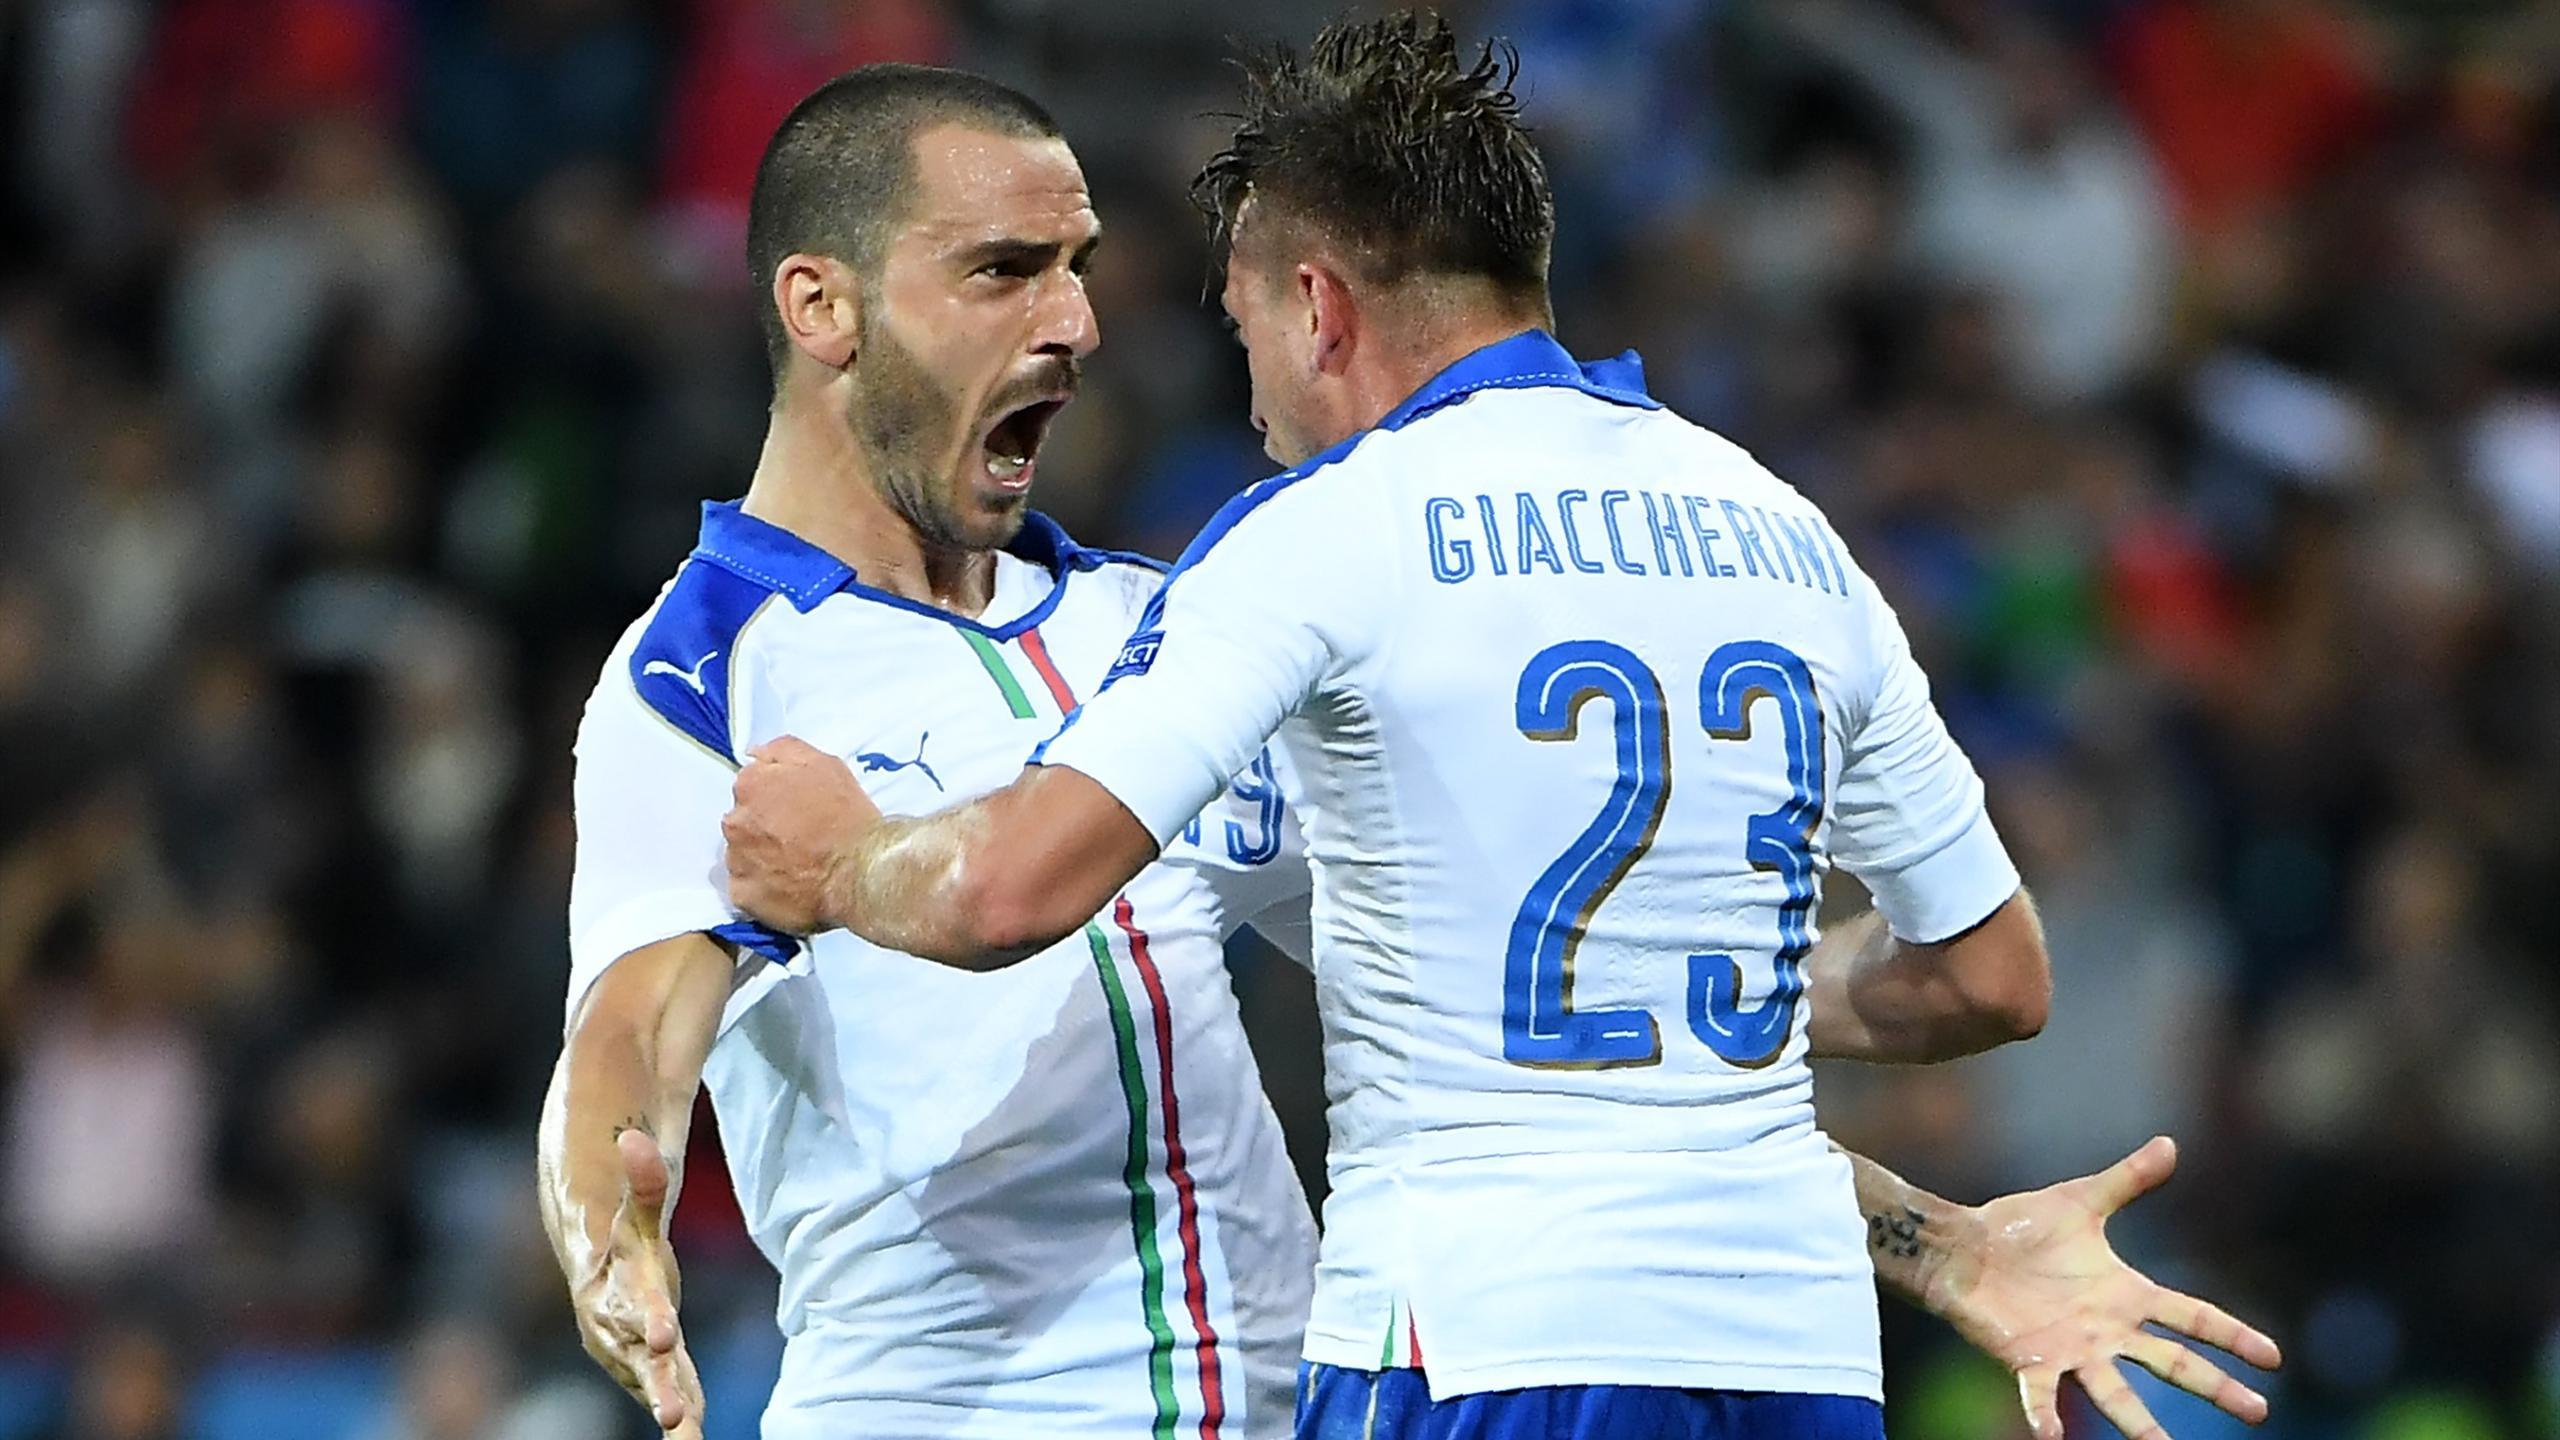 Bonucci and Giaccherini - Belgium v Italy - Euro 2016